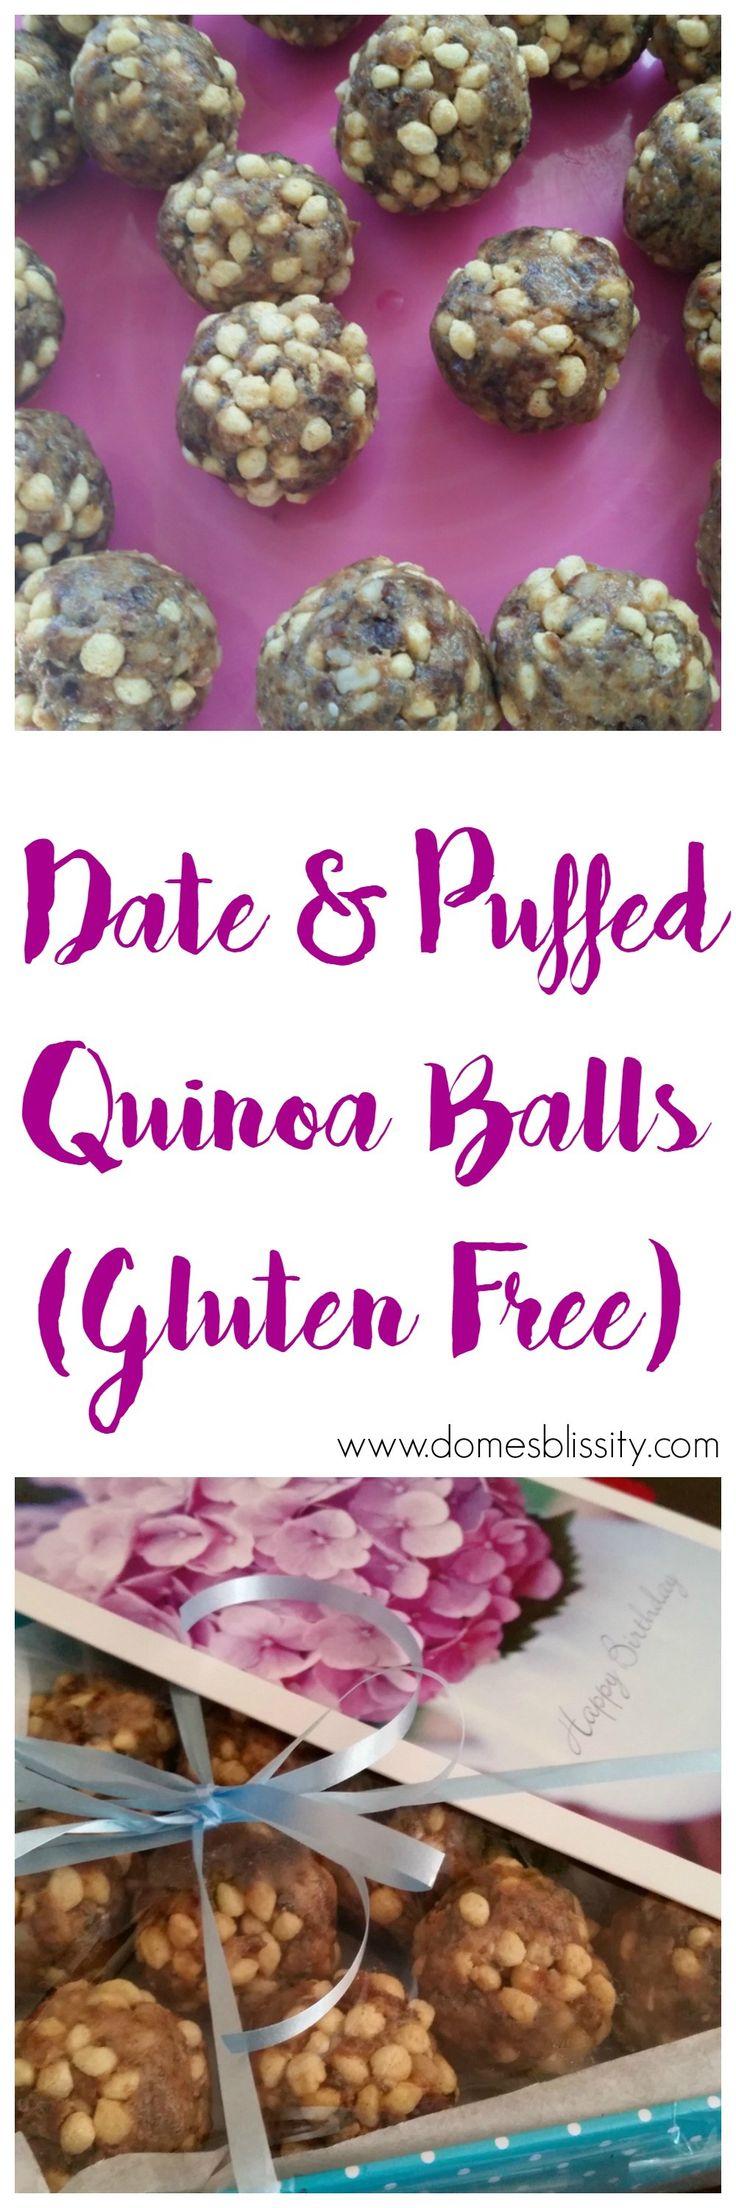 Gluten Free Date Puffed Quinoa Balls - a wholesome snack!